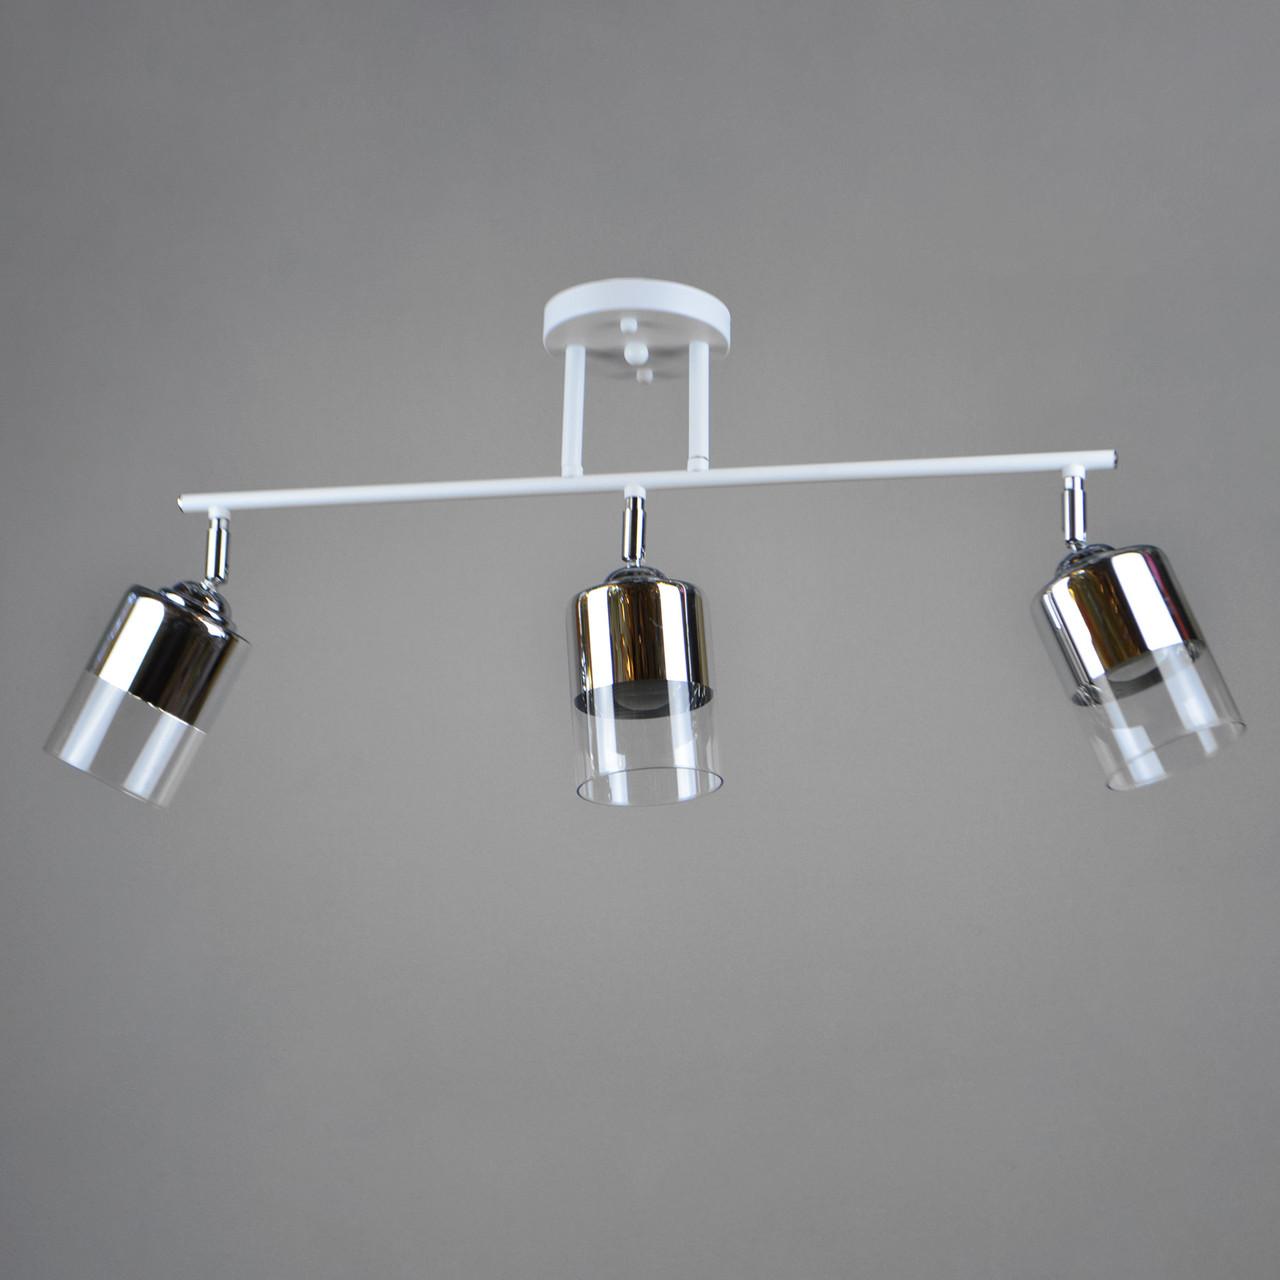 Люстра потолочная на три лампы 29-K076/3 CR+WT+WT